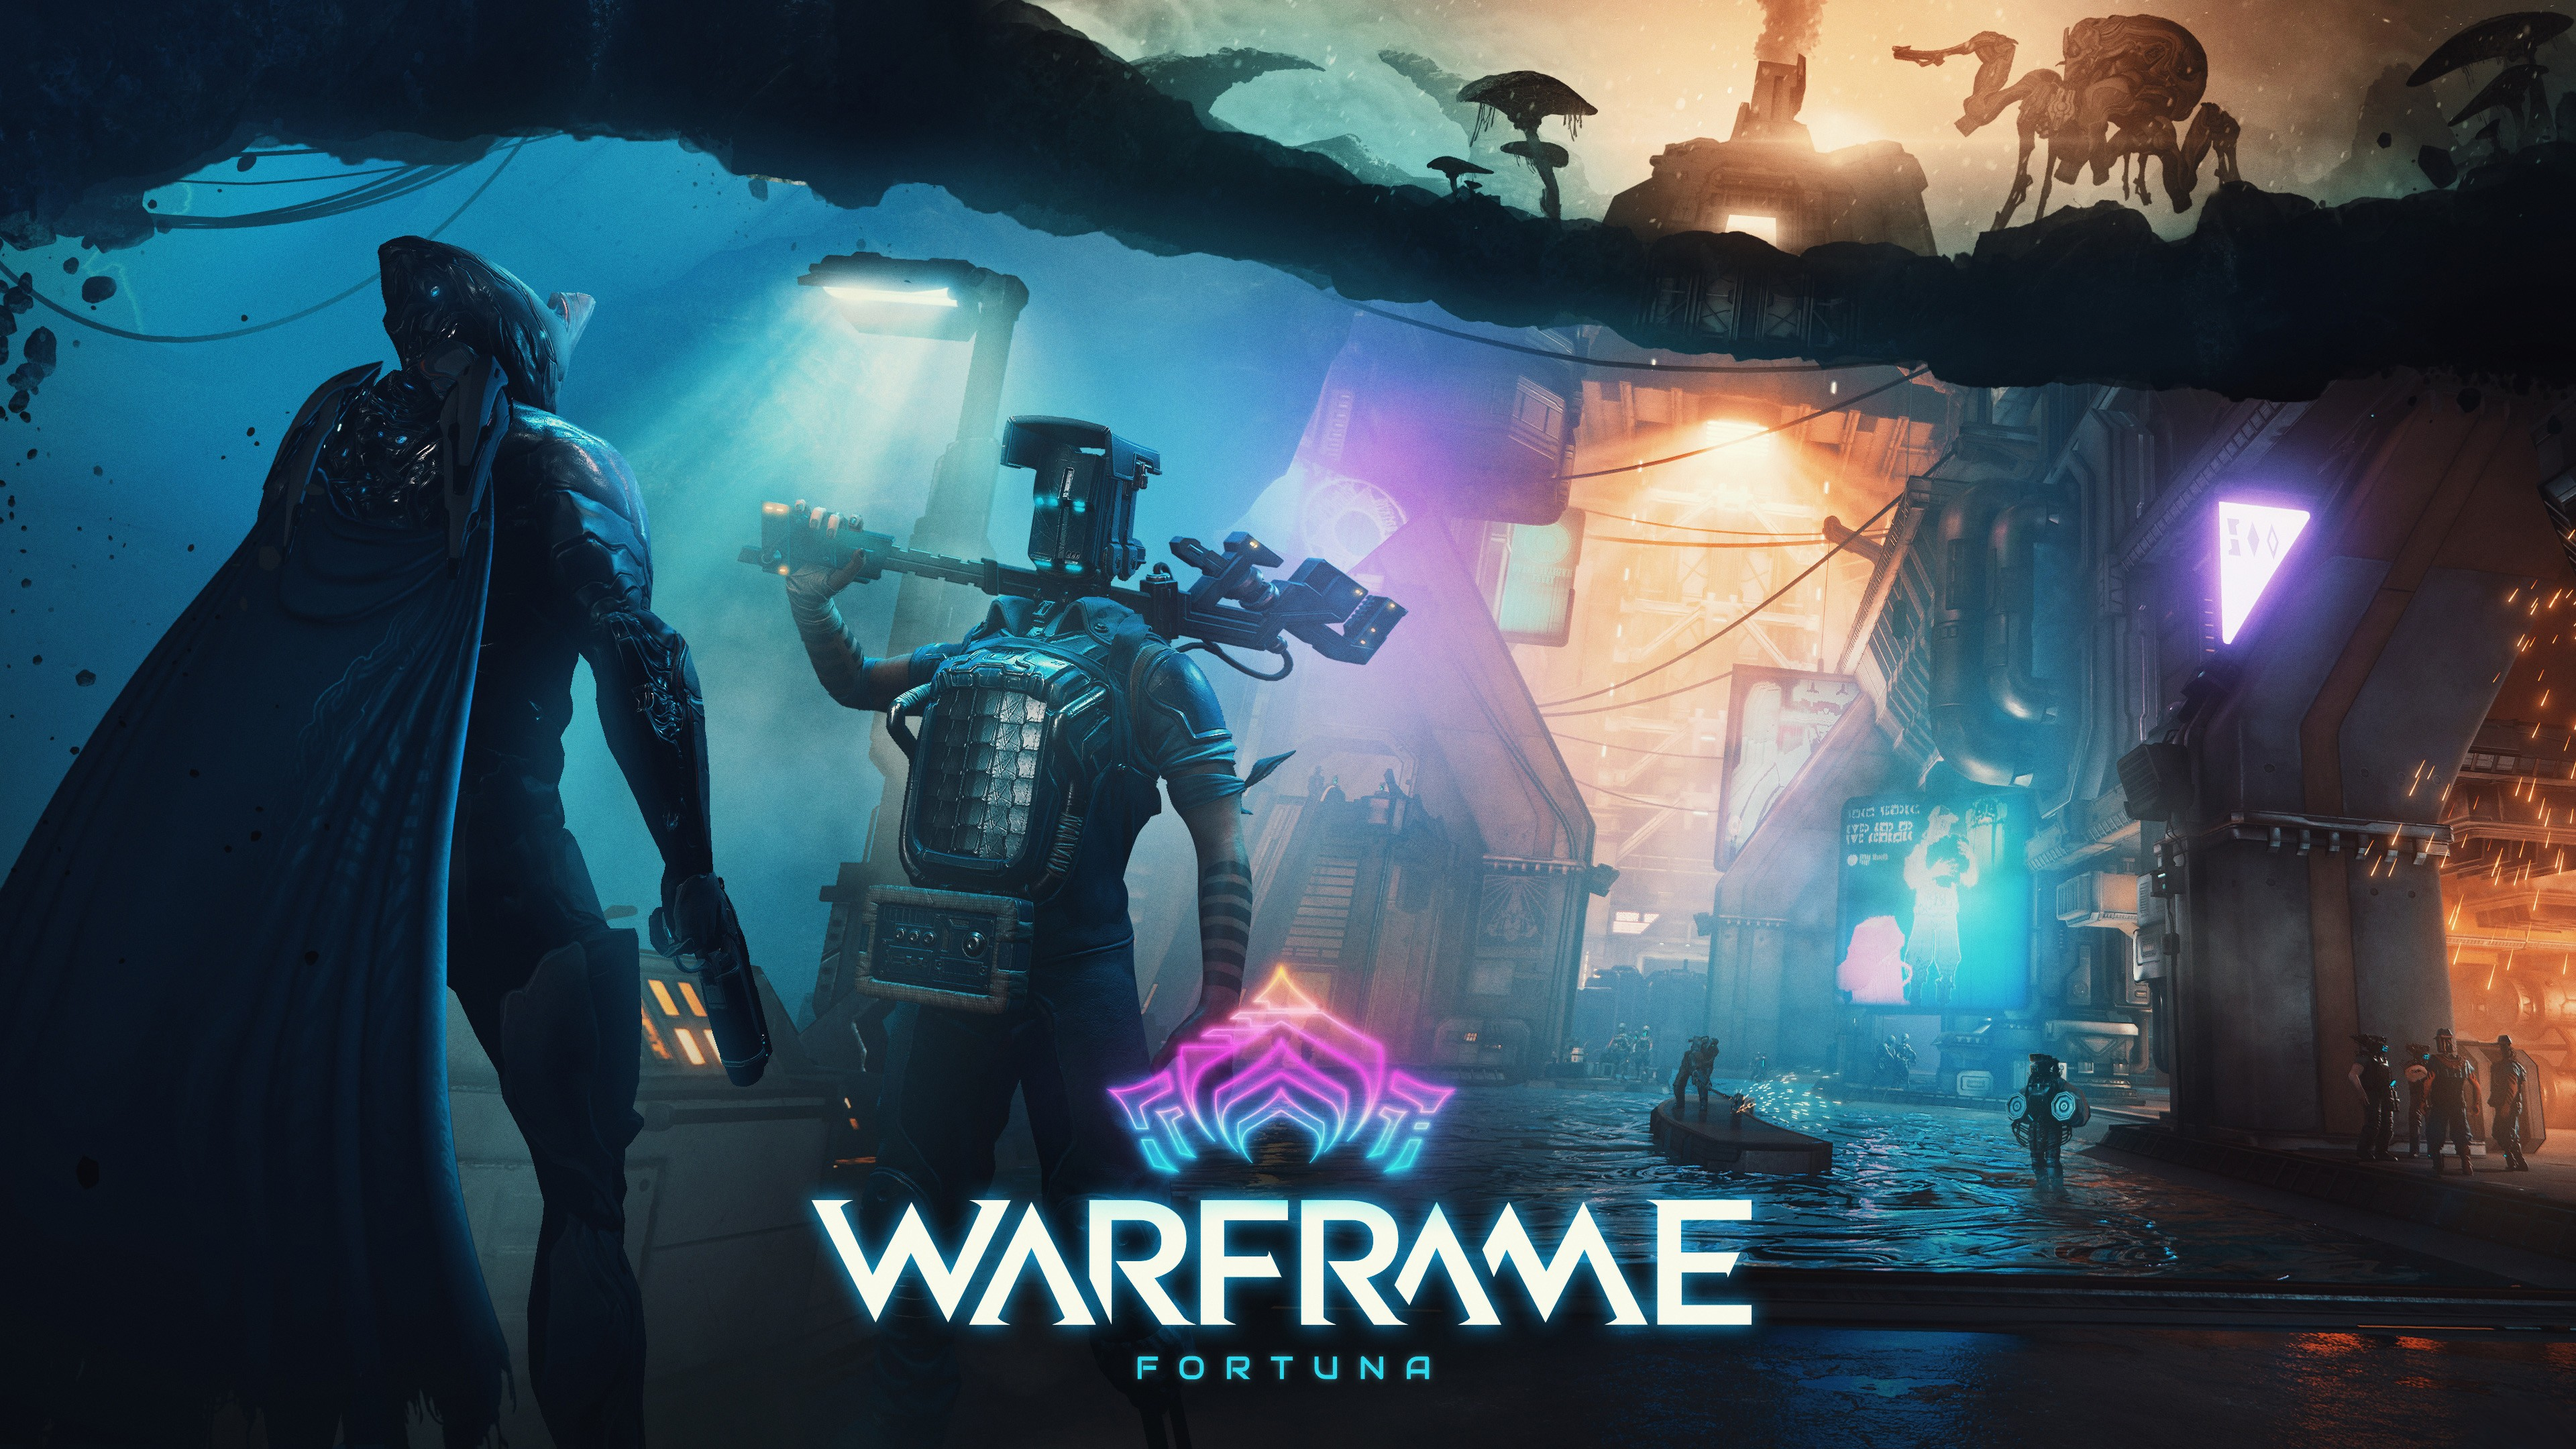 Warframe Fortuna , HD Wallpaper & Backgrounds